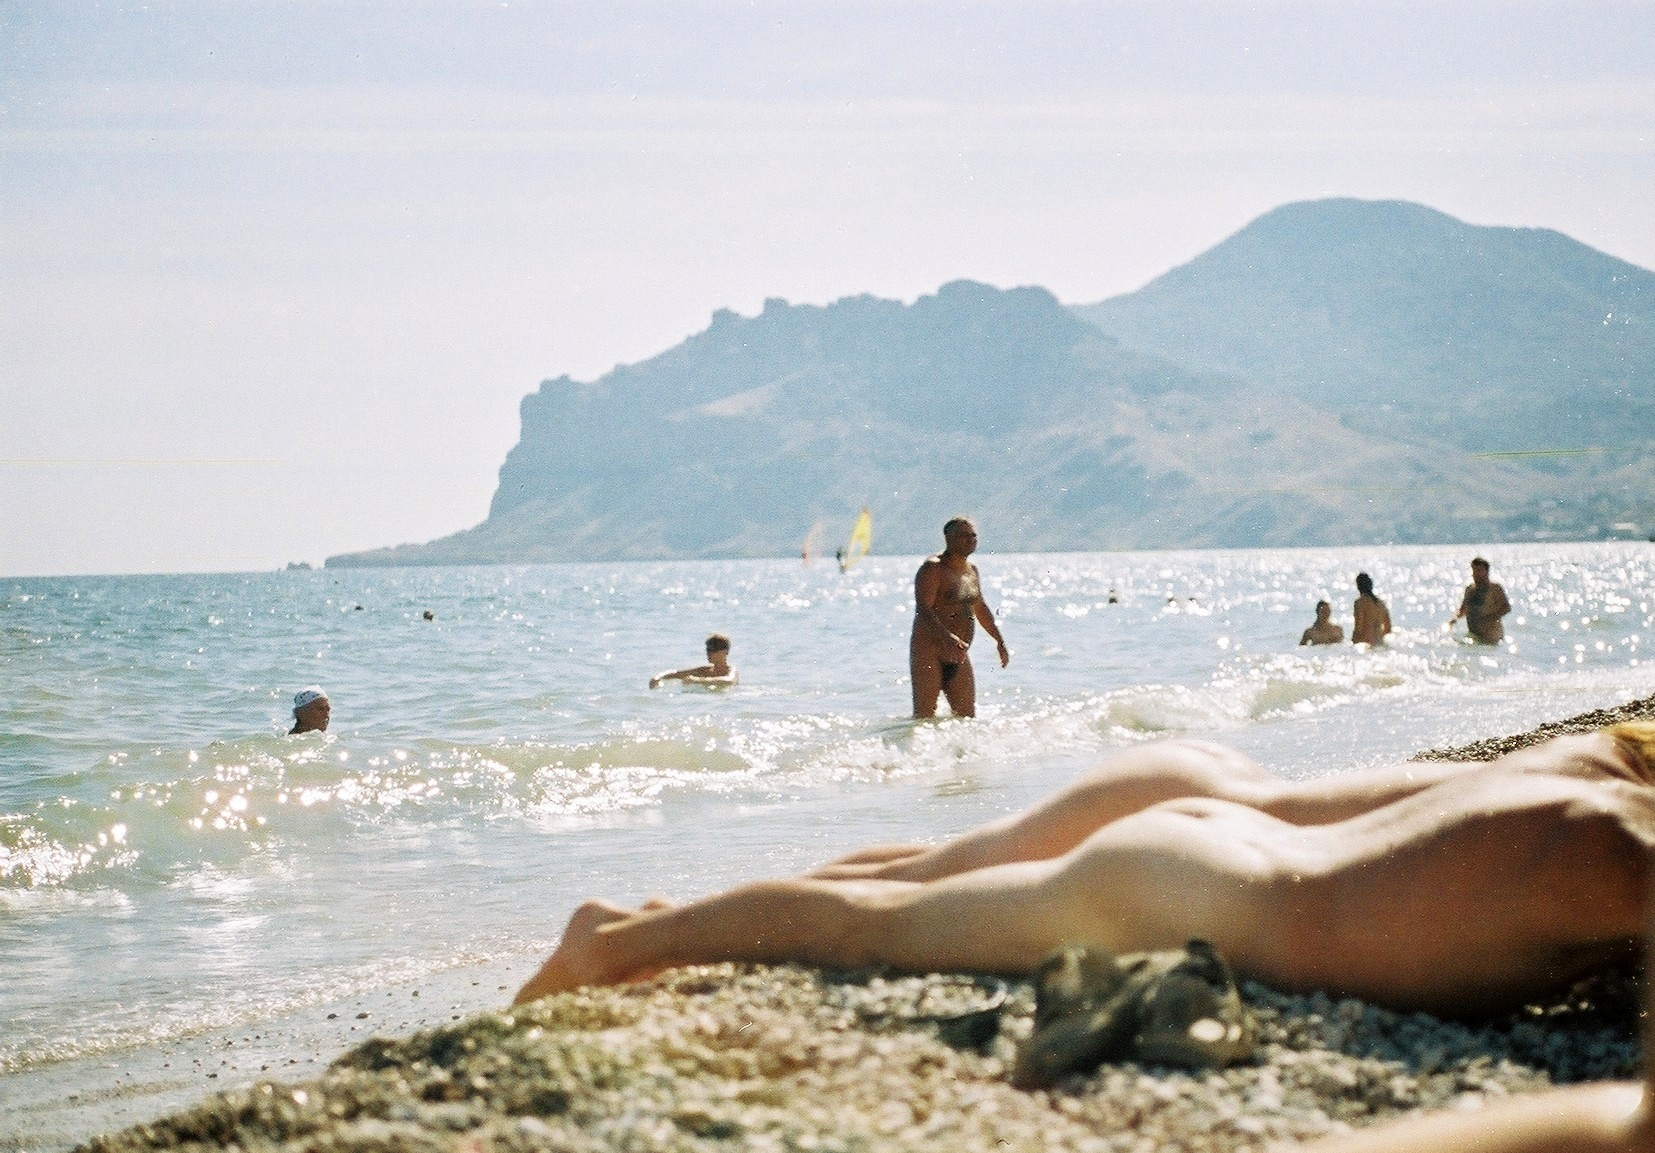 foto-s-plyazhey-nudiskih-krima